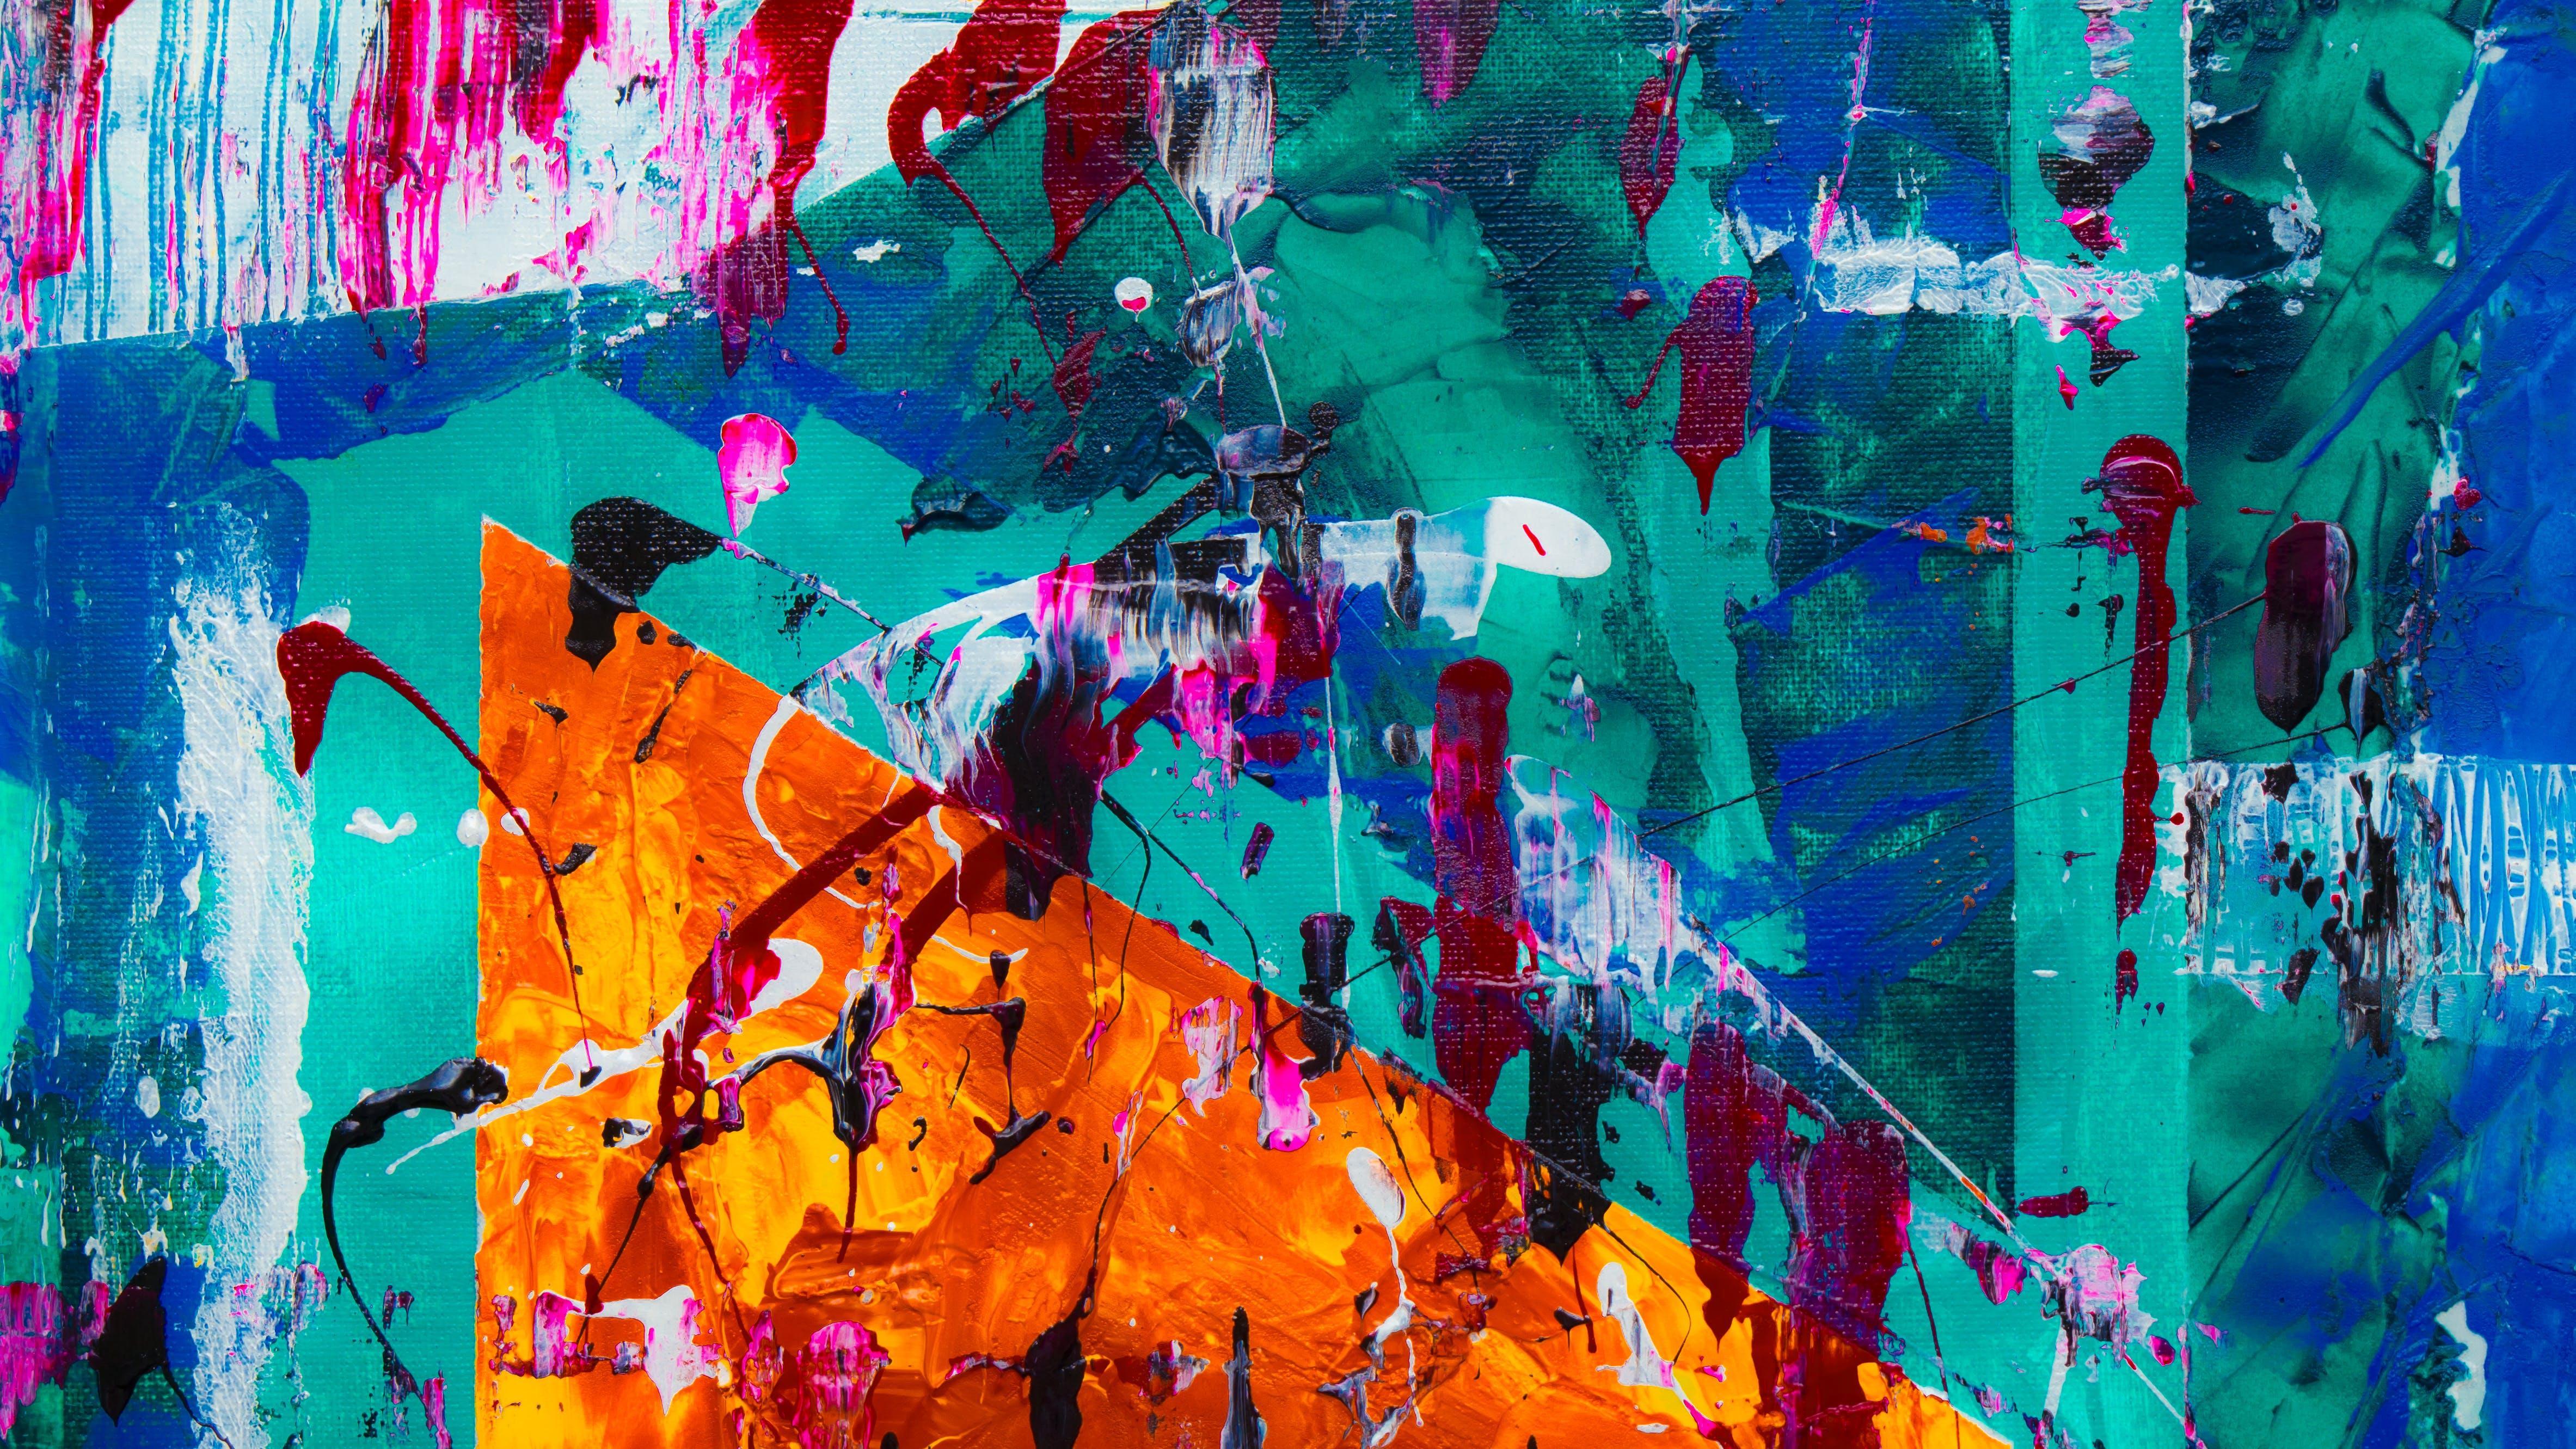 abstrakter expressionismus, abstraktes gemälde, acryl